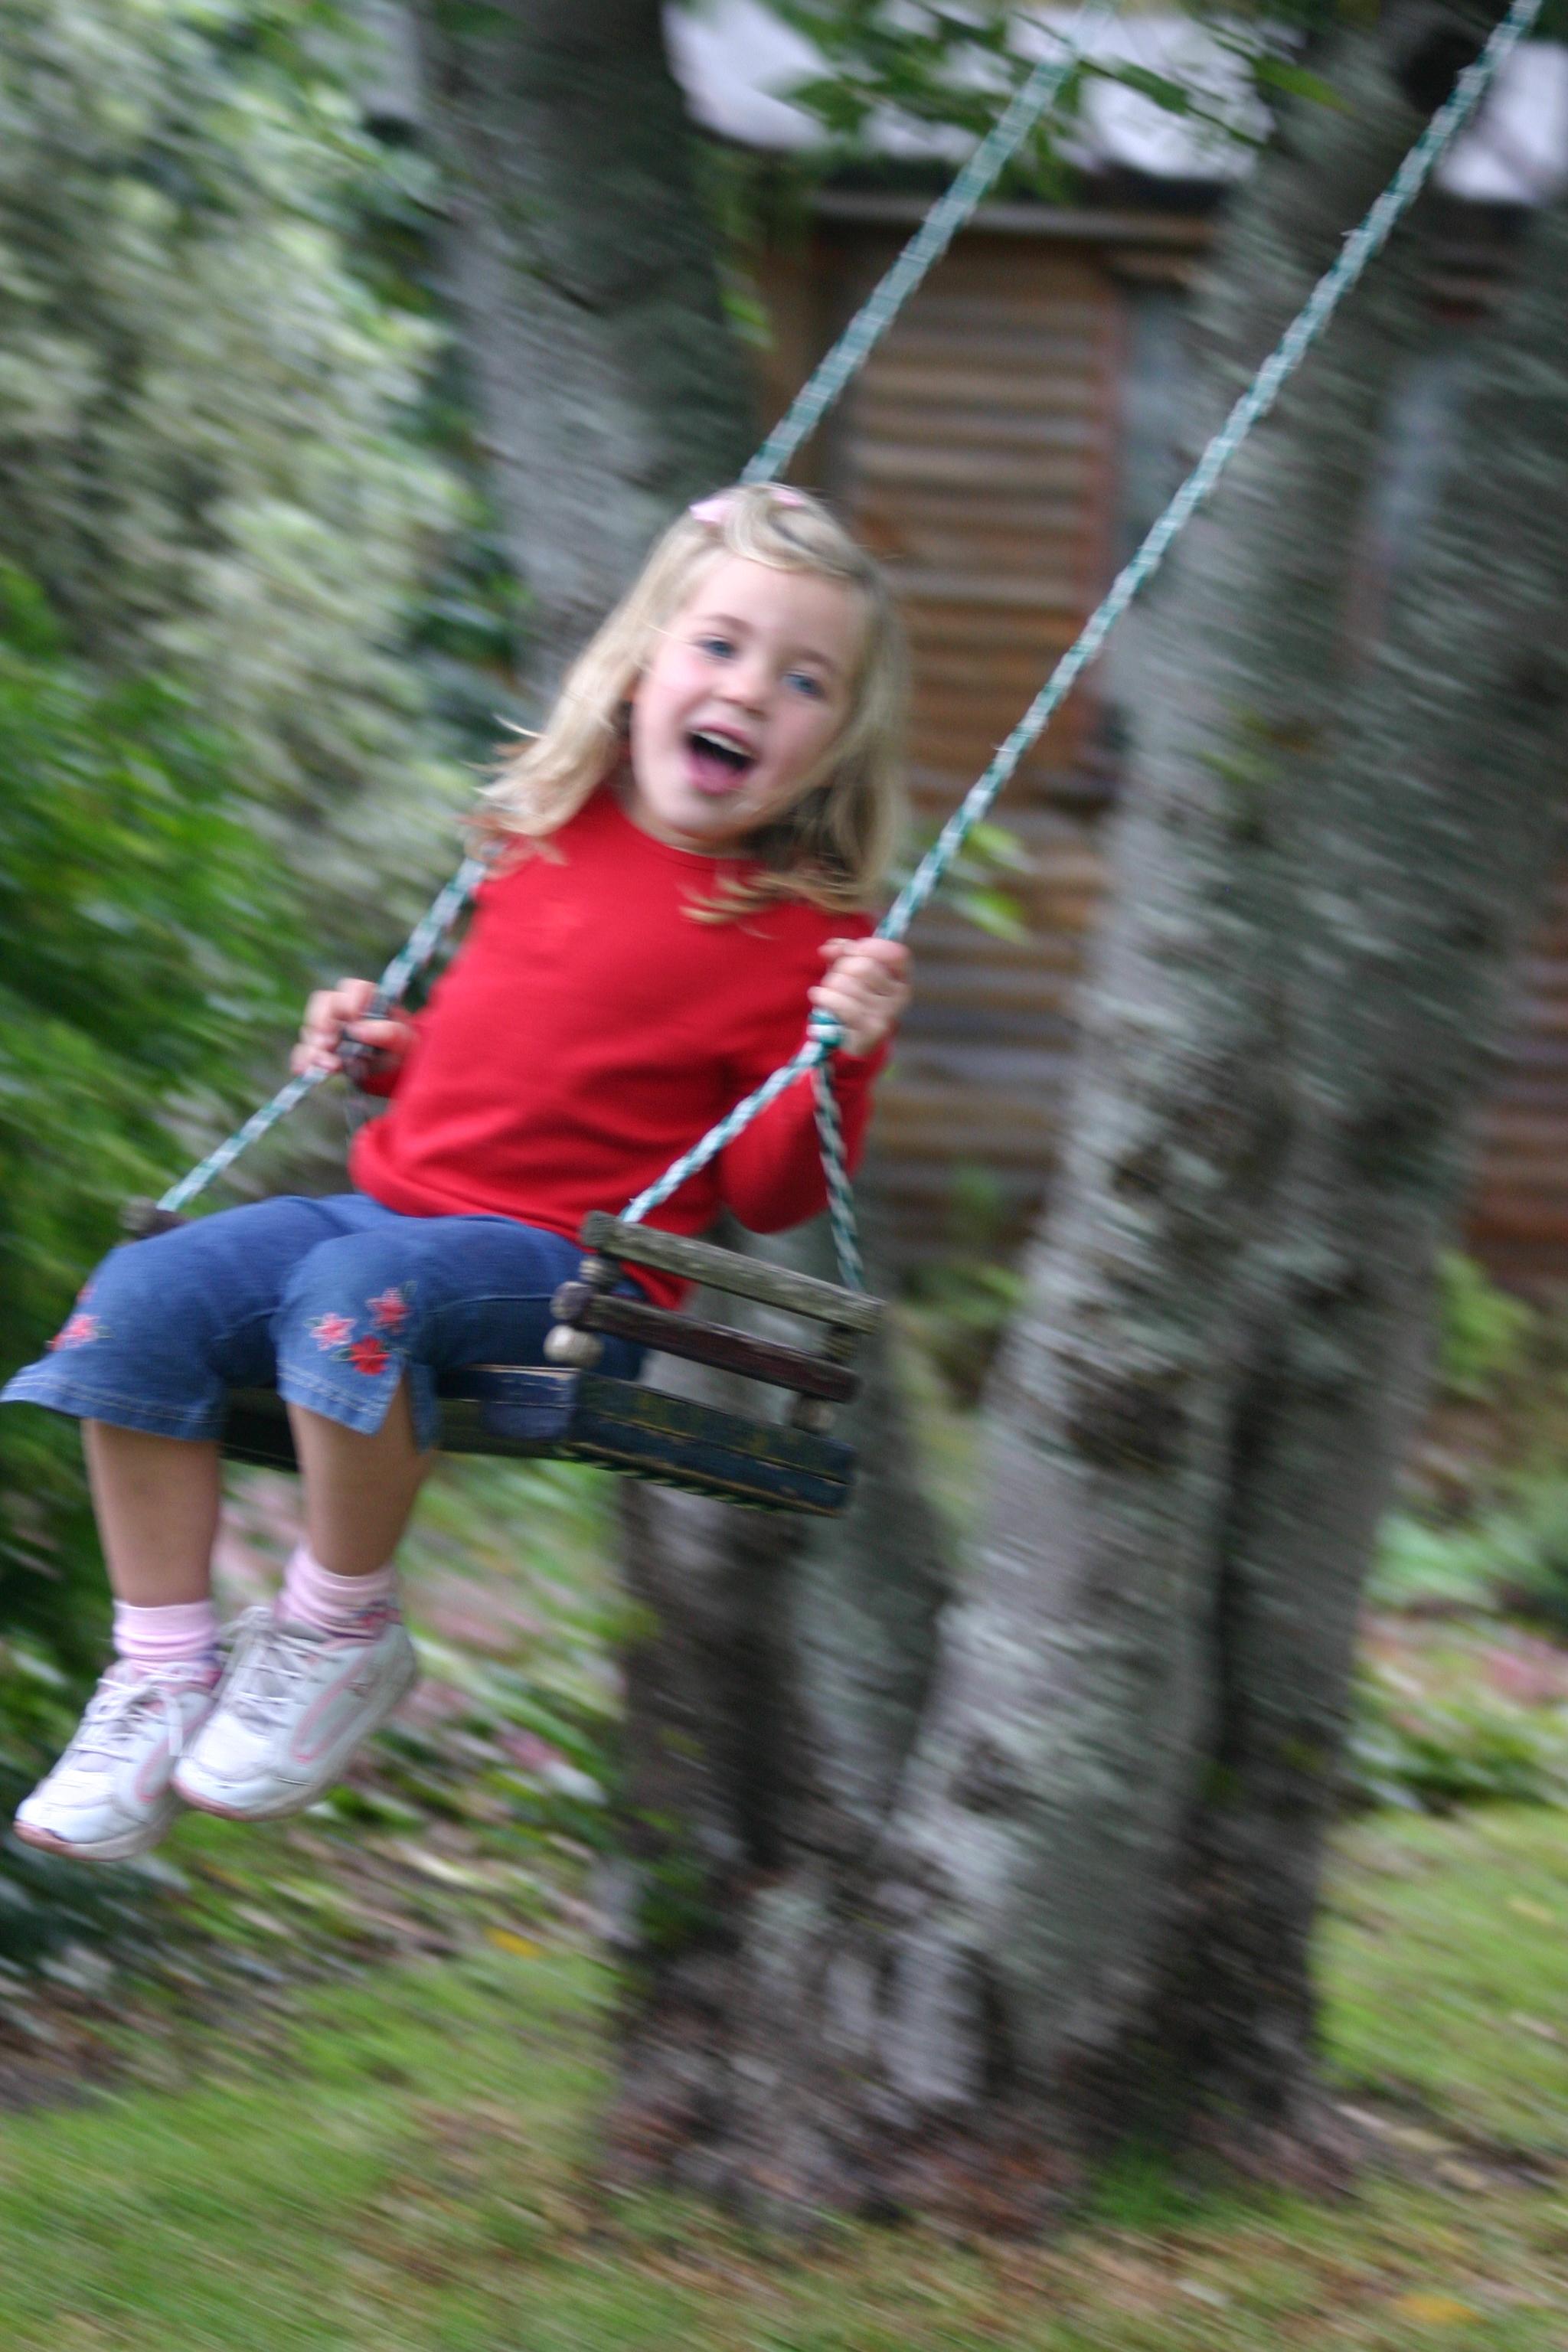 Michaela swinging